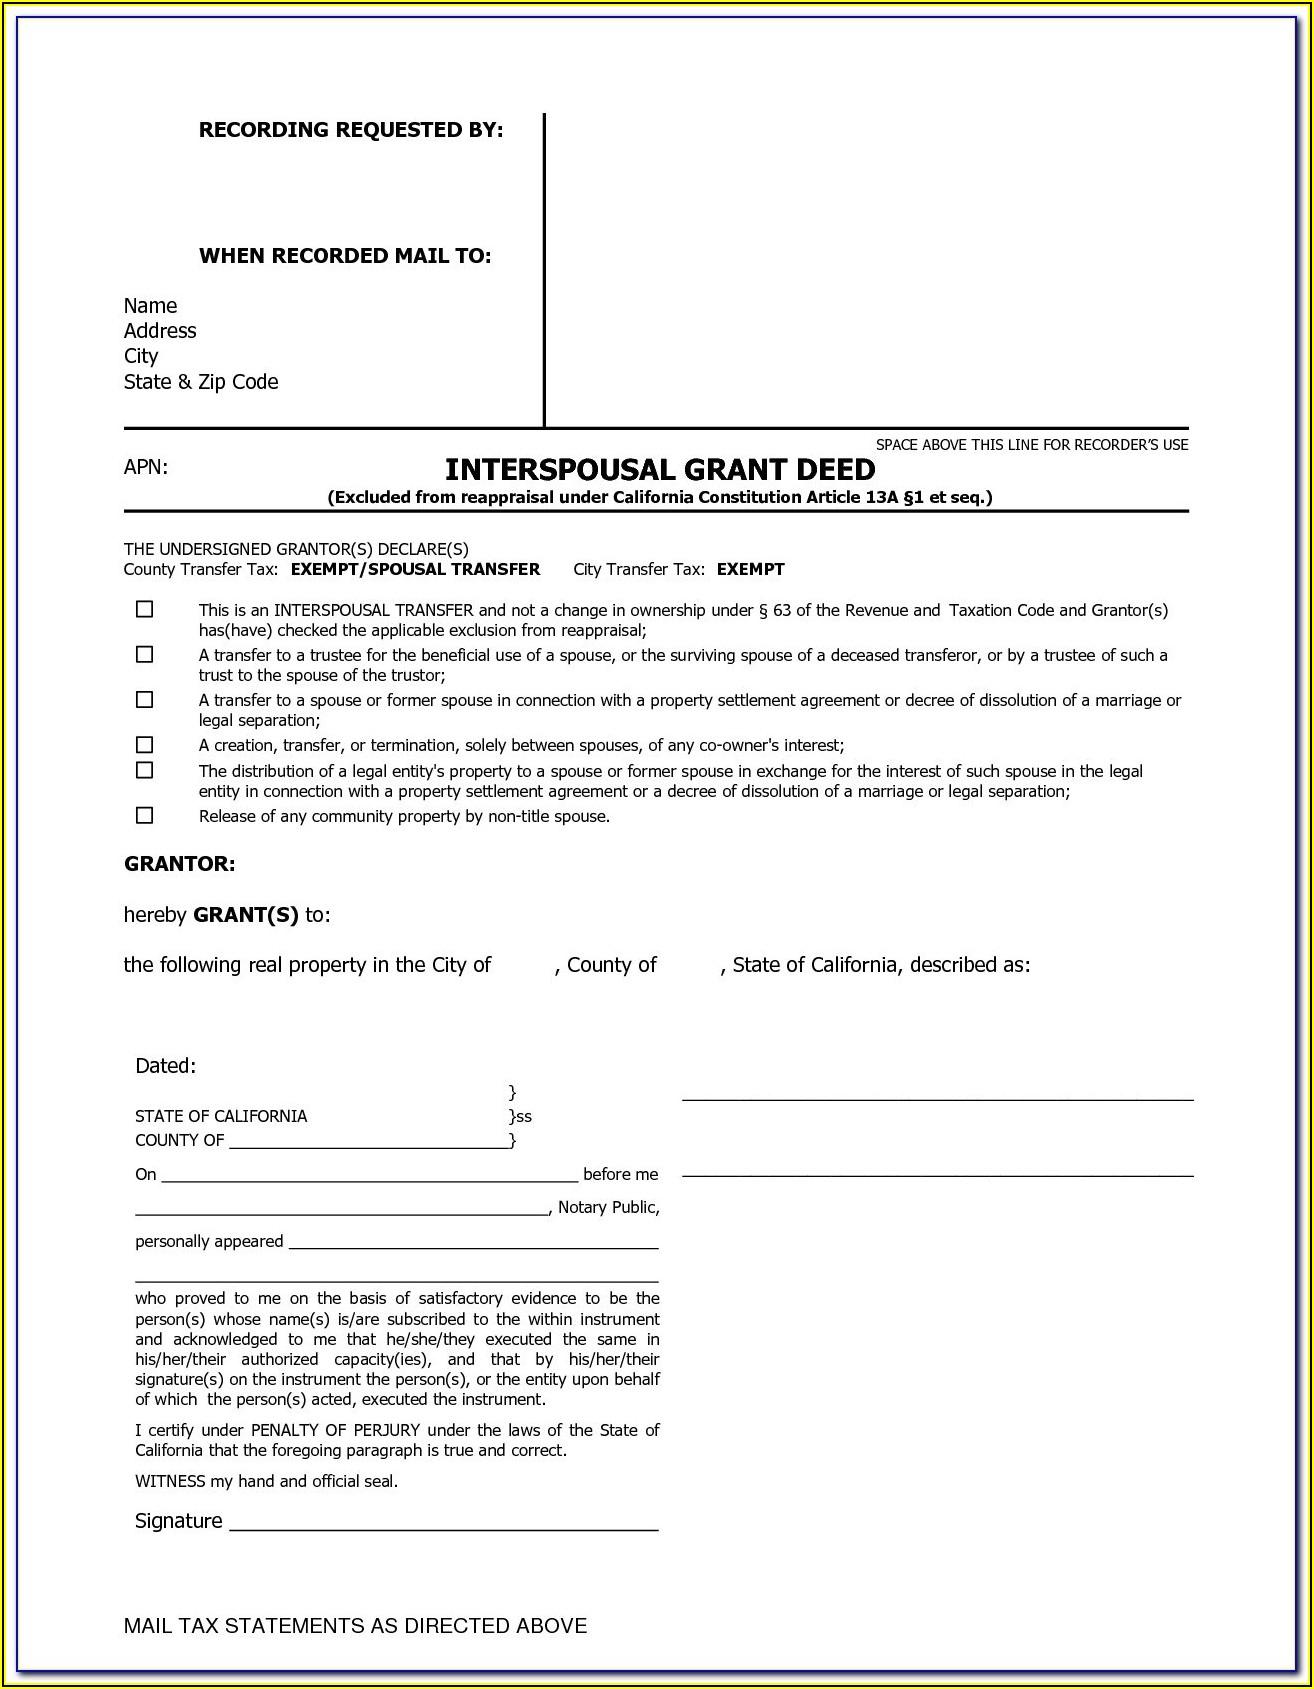 Interspousal Deed Transfer California Form